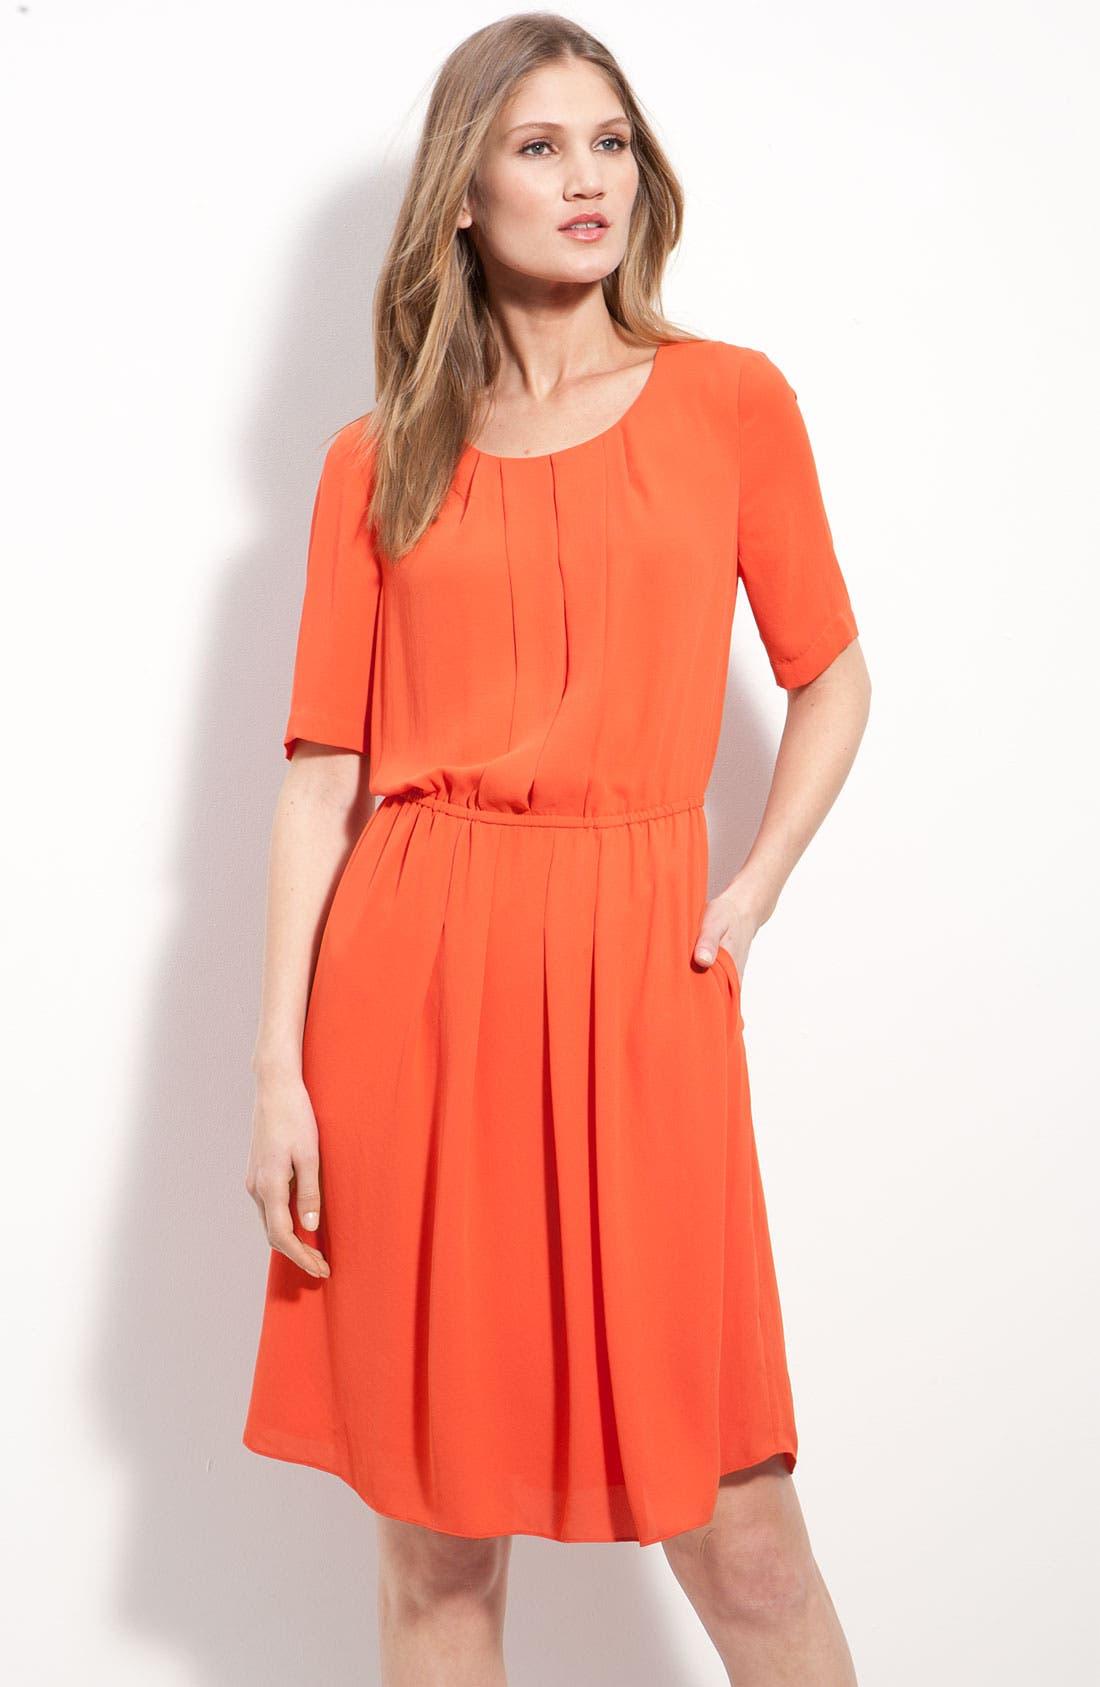 Alternate Image 1 Selected - BCBGMAXAZRIA Pleated Chiffon Dress